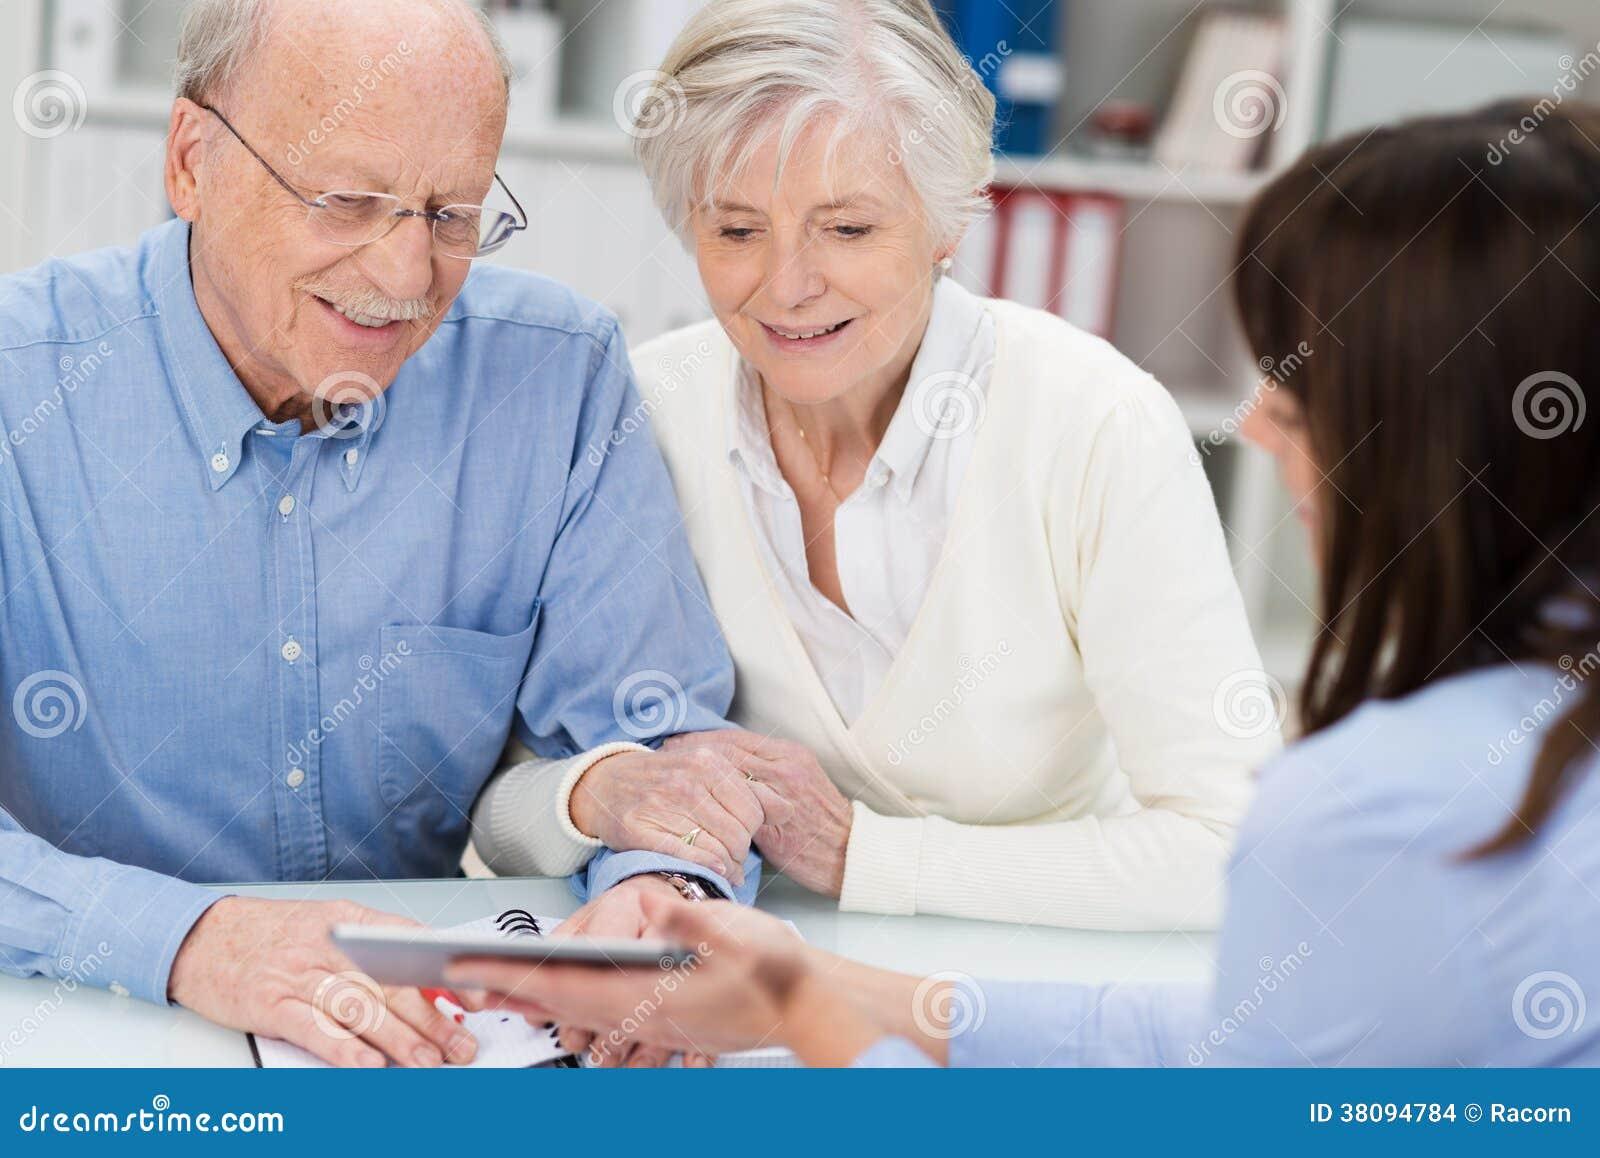 Elderly couple receiving financial advice